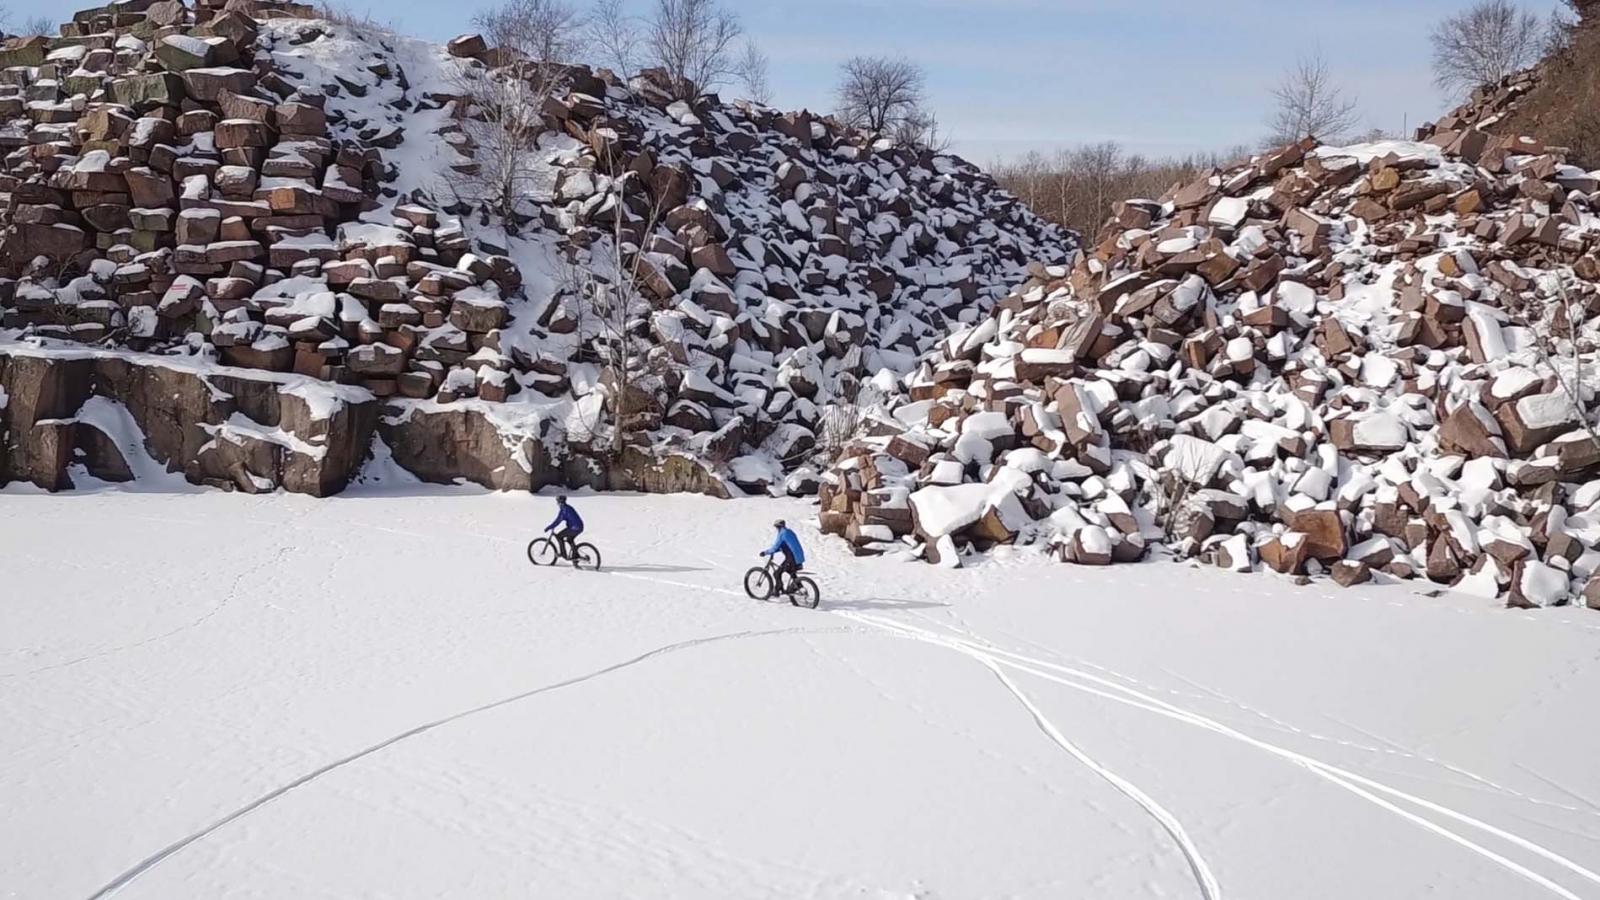 Two people fat biking at Quarry Park in St. Cloud, Minnesota.